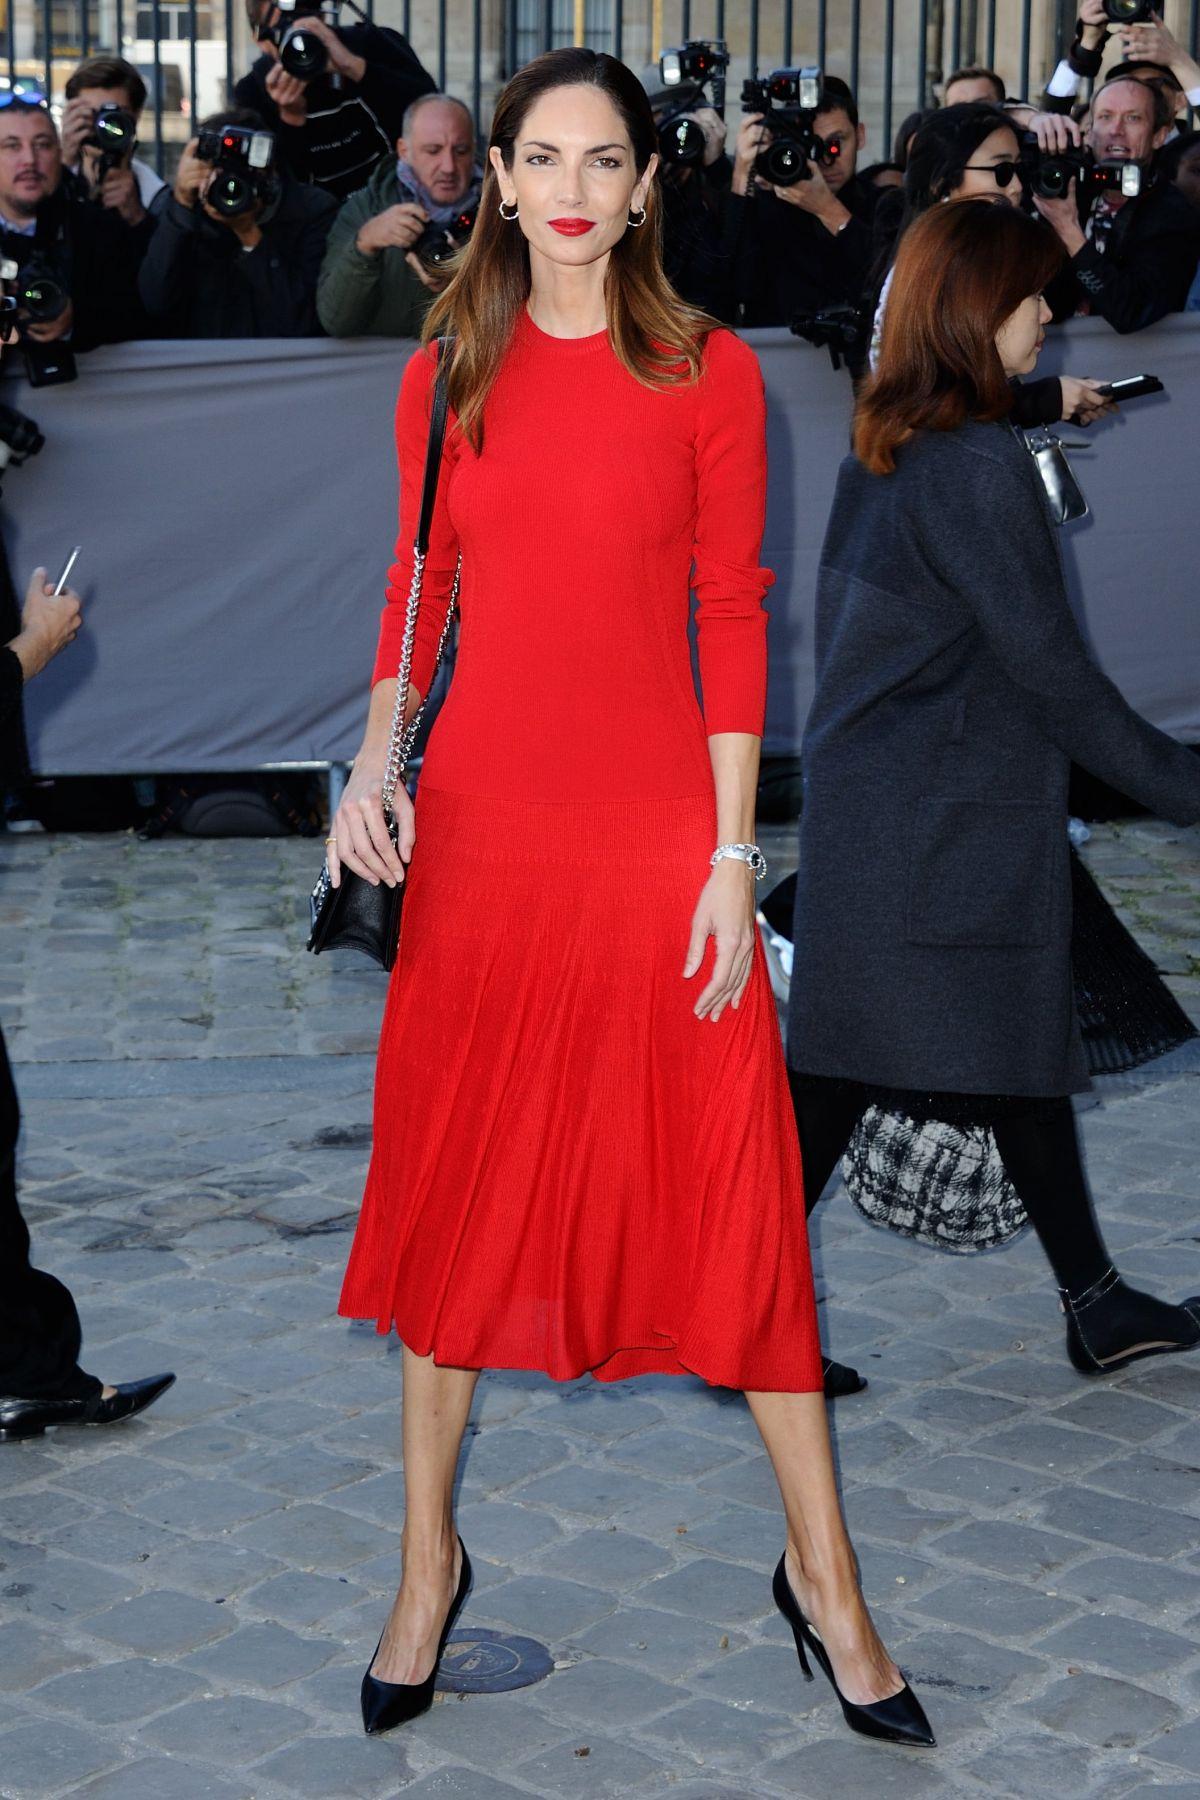 EUGENIA SILVA at Christian Dior Fashion Show in Paris 10/02/2015